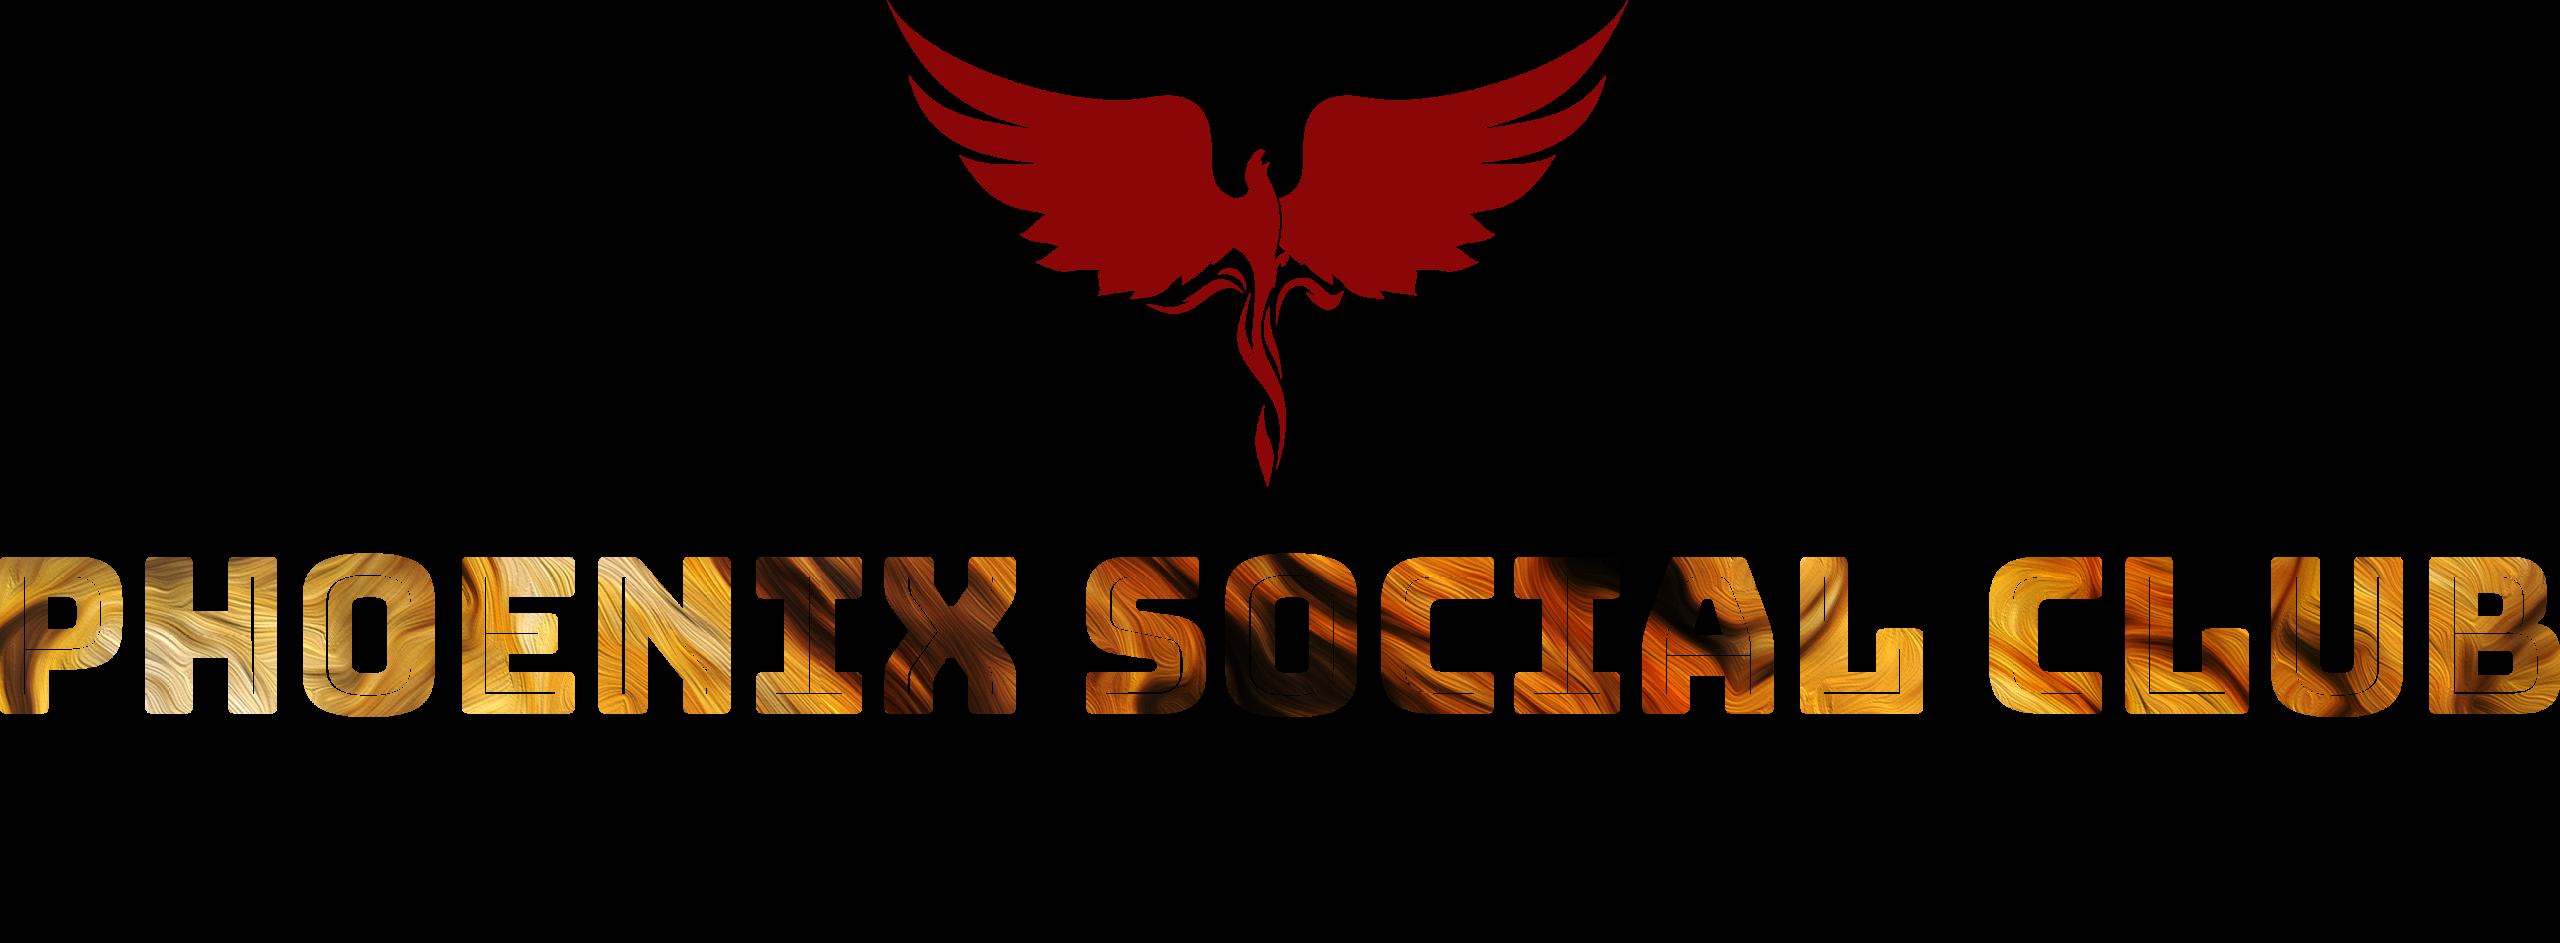 Phoenix Social Club logo